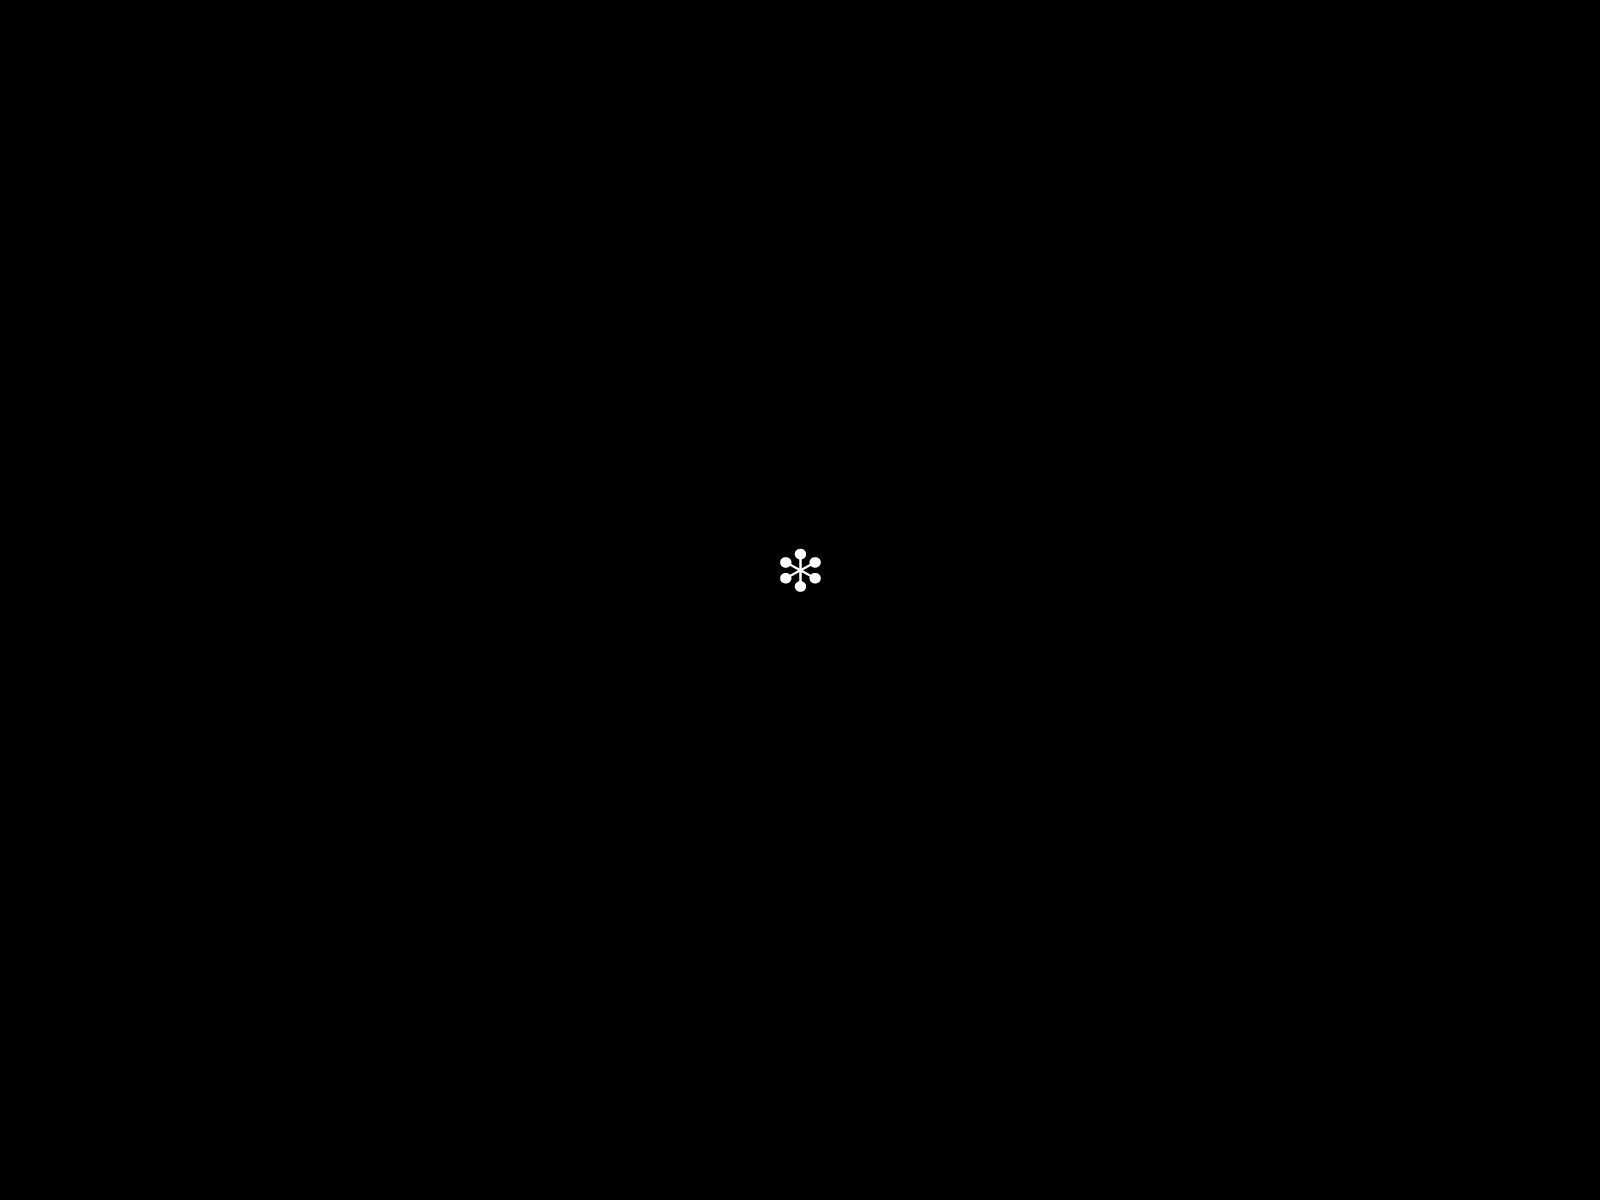 wallpaper hitam, wallpaper hitam android, wallpaper hitam hd, wallpaper hitam untuk pc, wallpaper hitam untuk desktop, latar belakang wallpaper hitam,